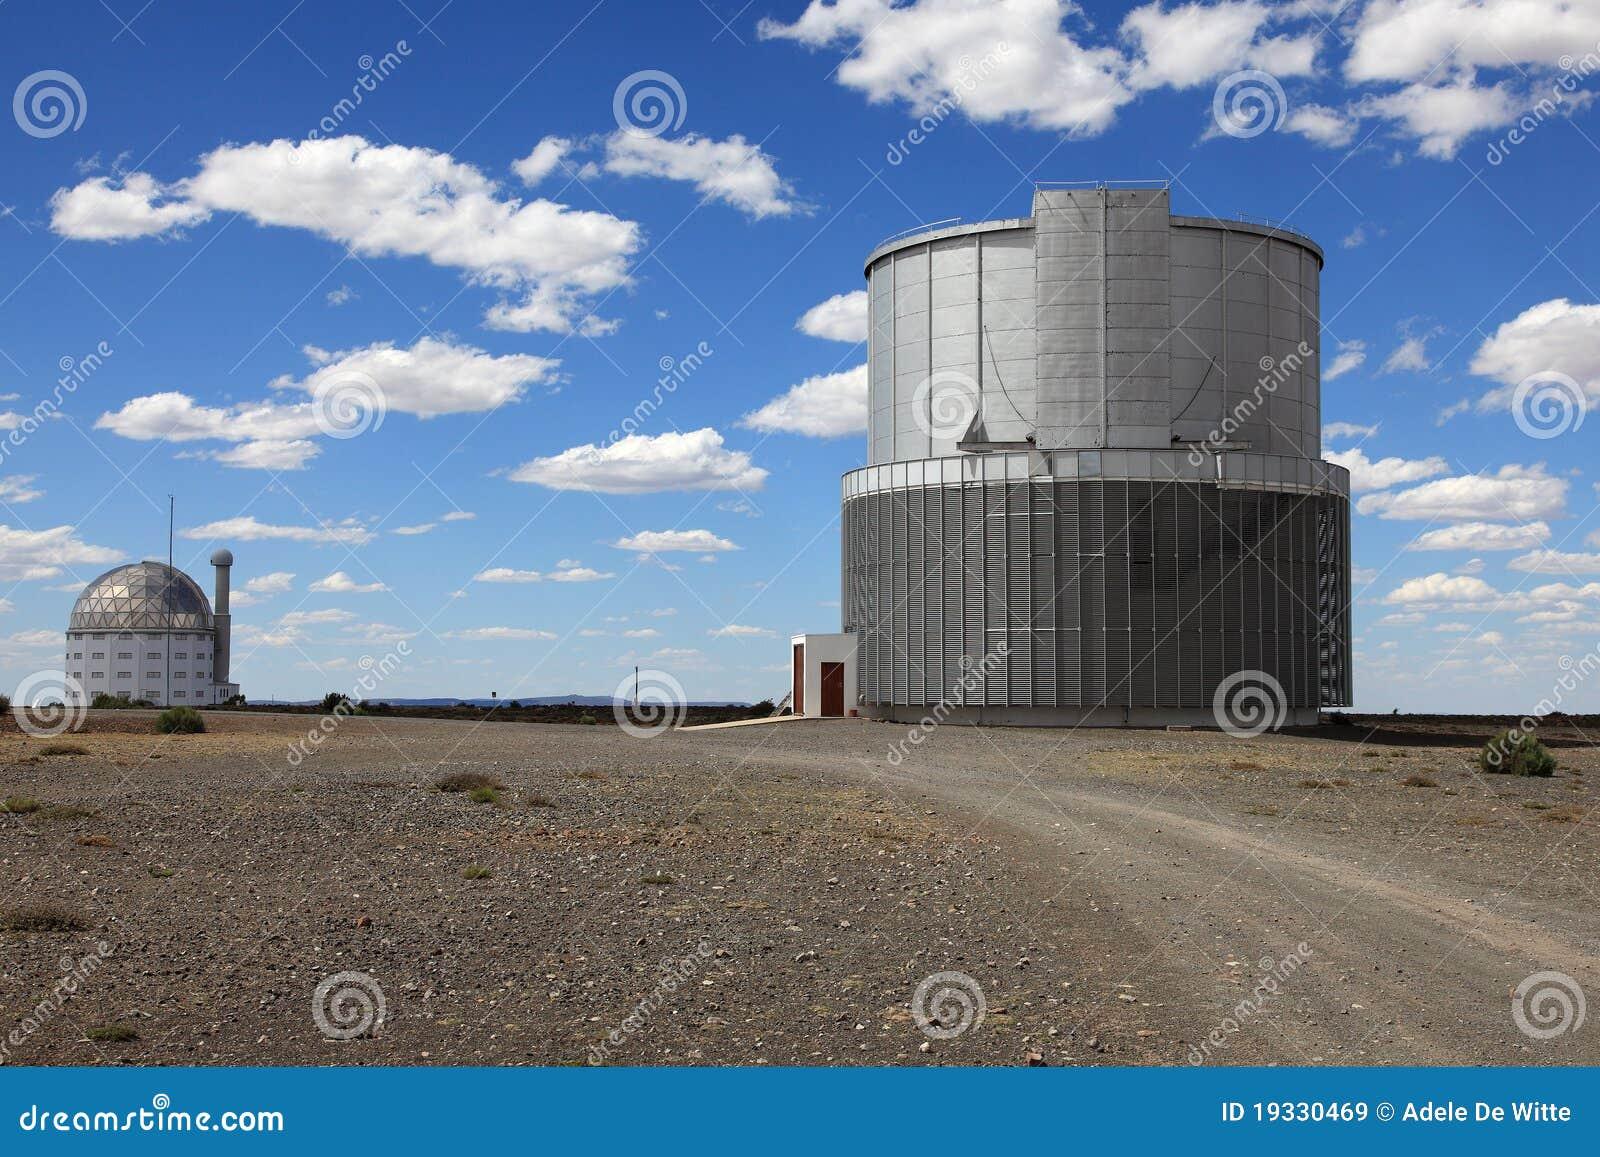 Astronomische teleskope in südafrika redaktionelles stockbild